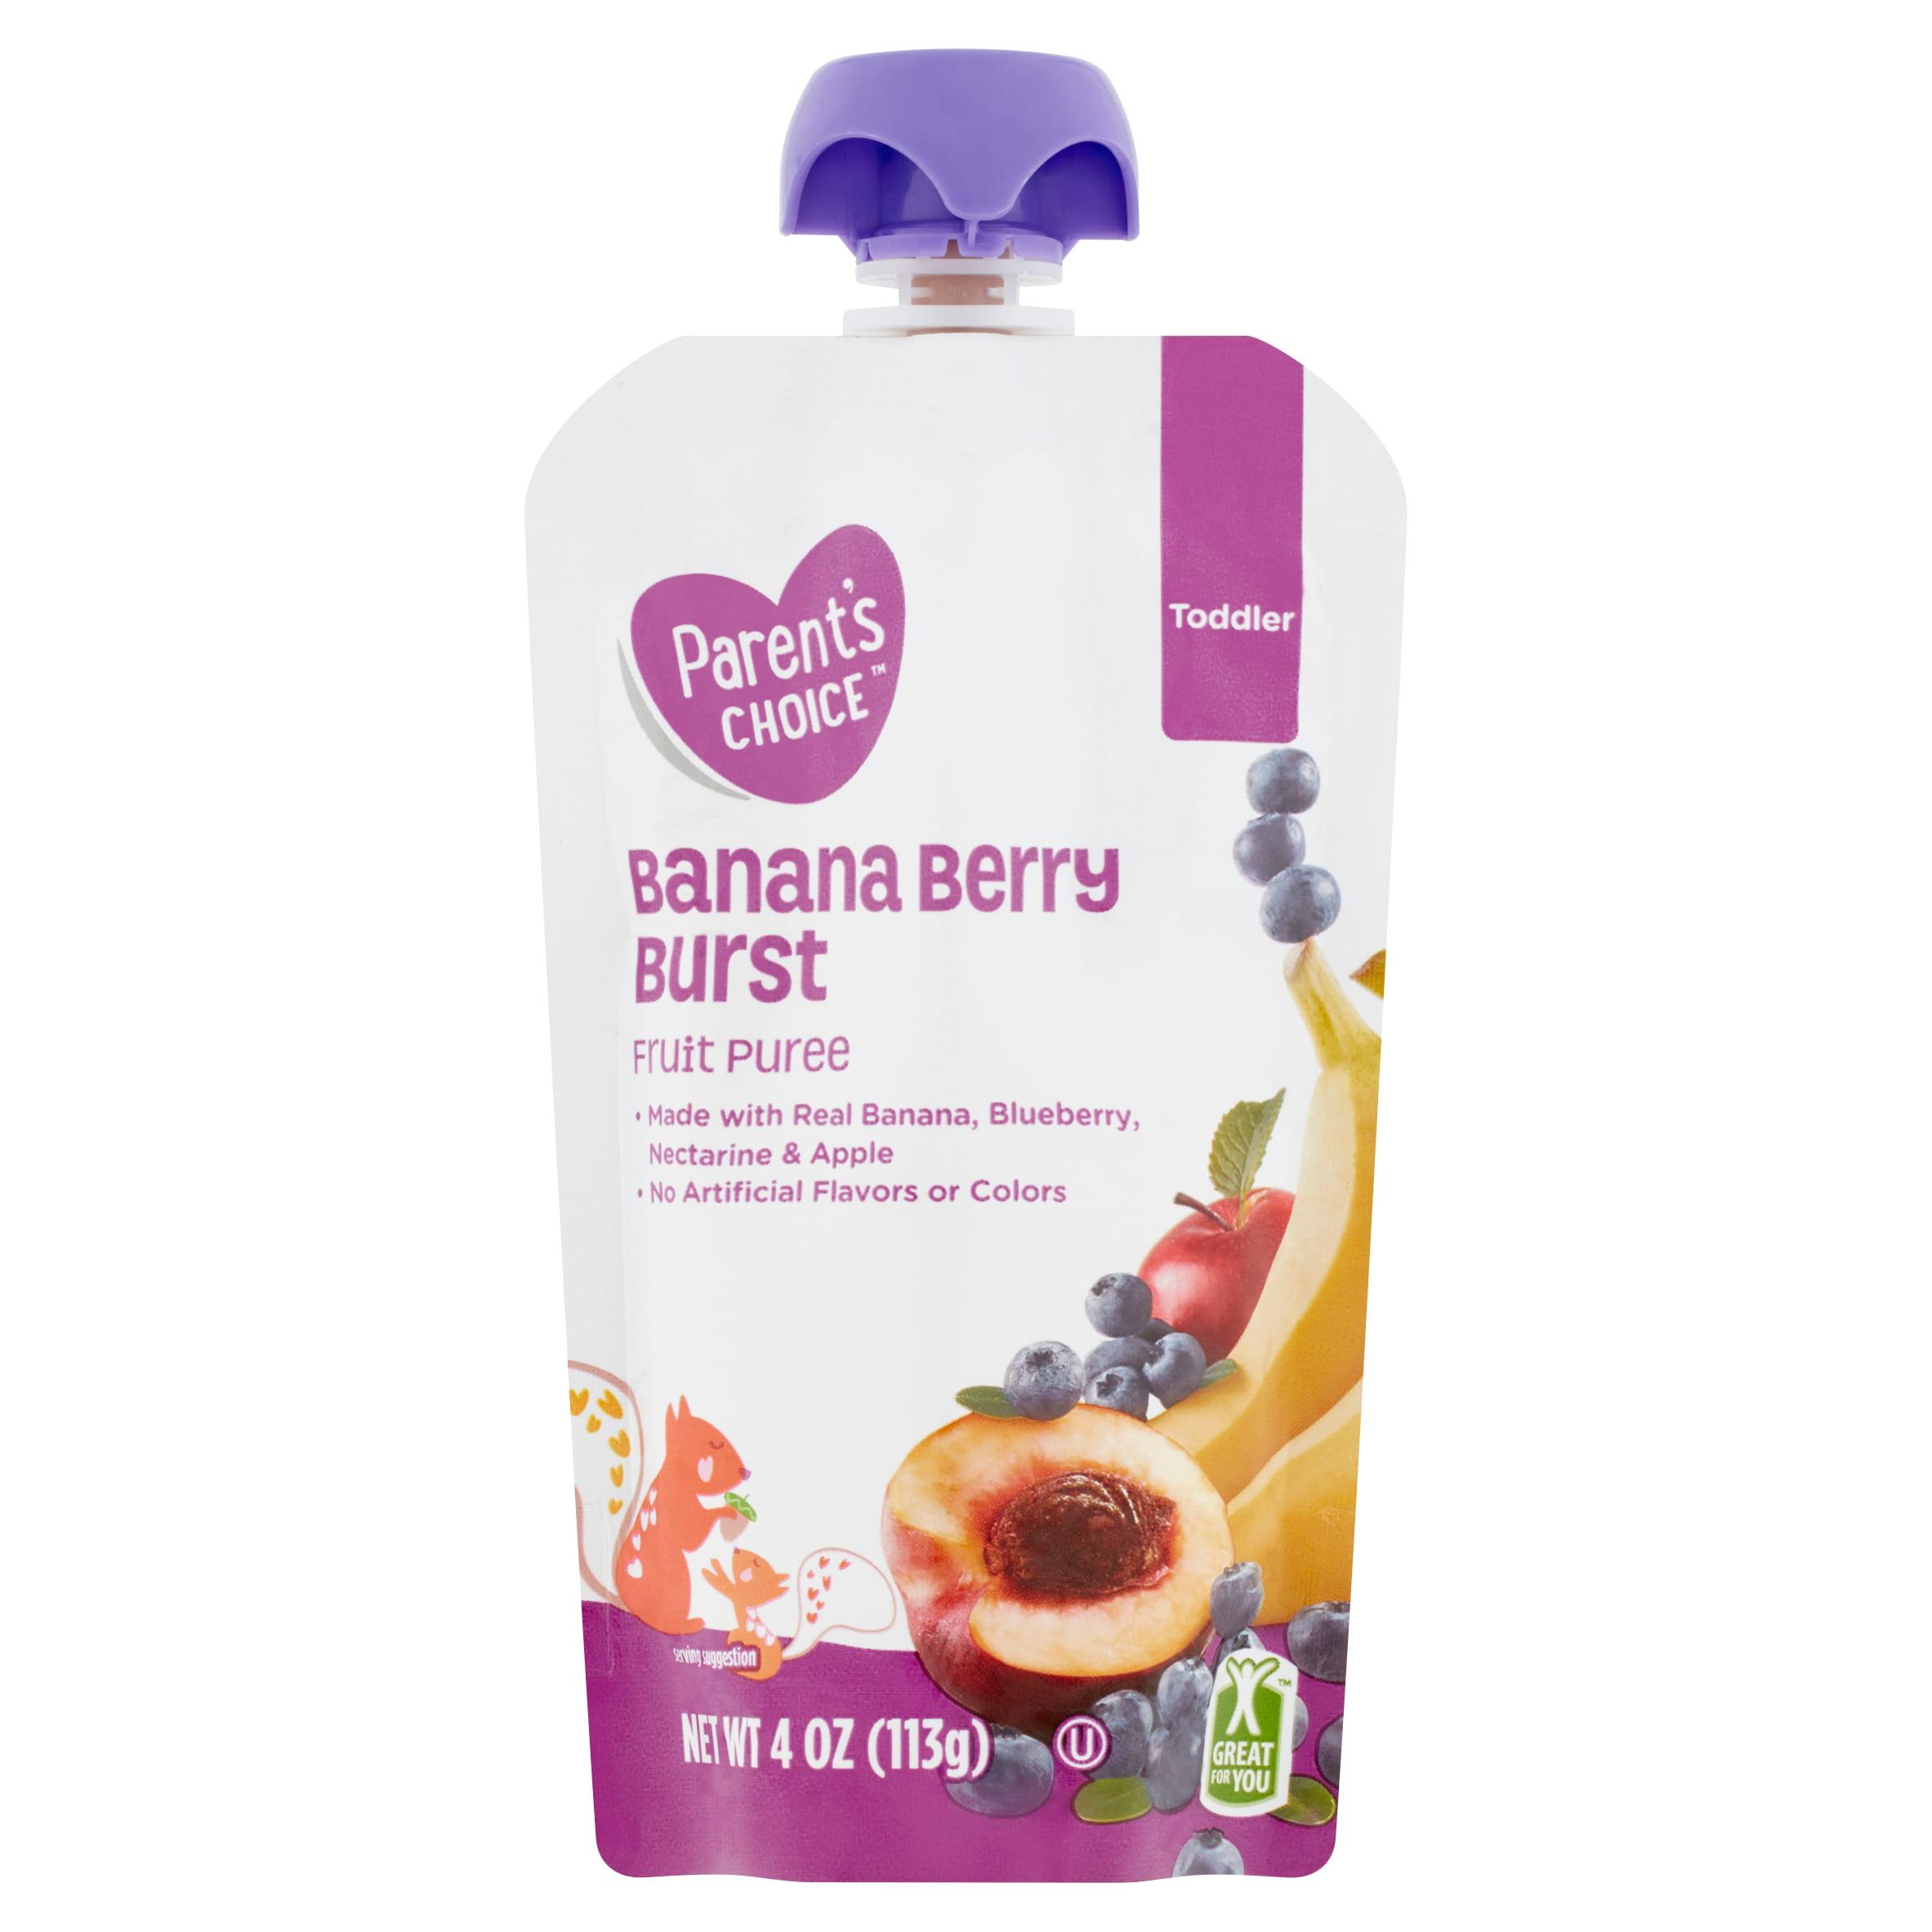 Parent's Choice Banana Berry Burst, Toddler, 4 oz Pouch